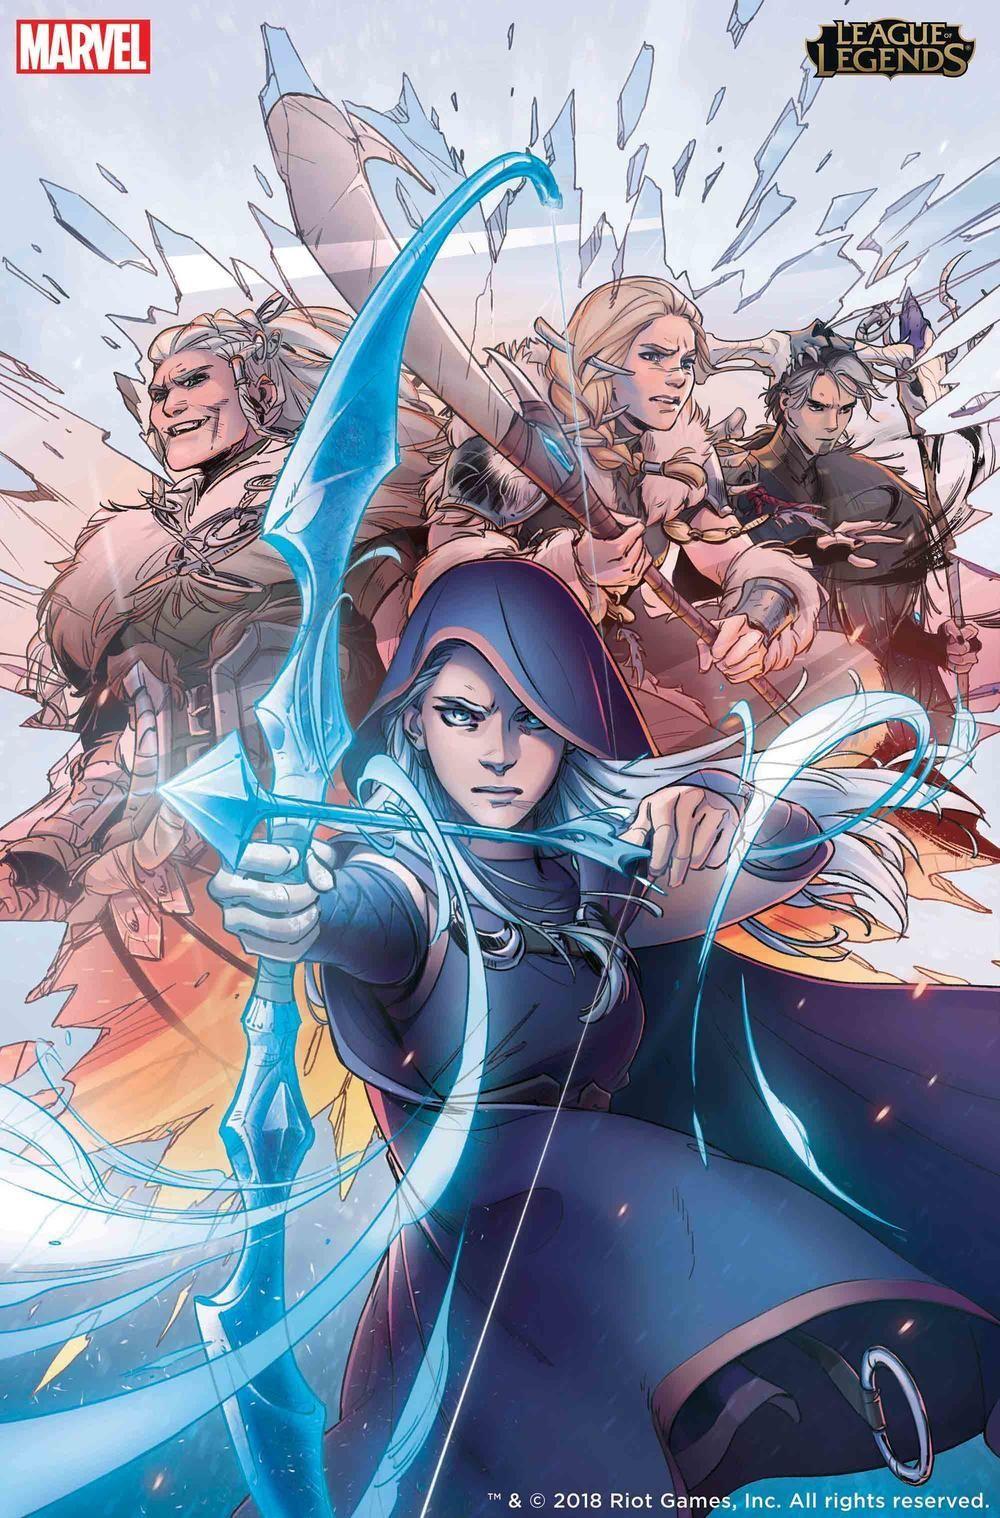 League of Legends graphic novel Marvel